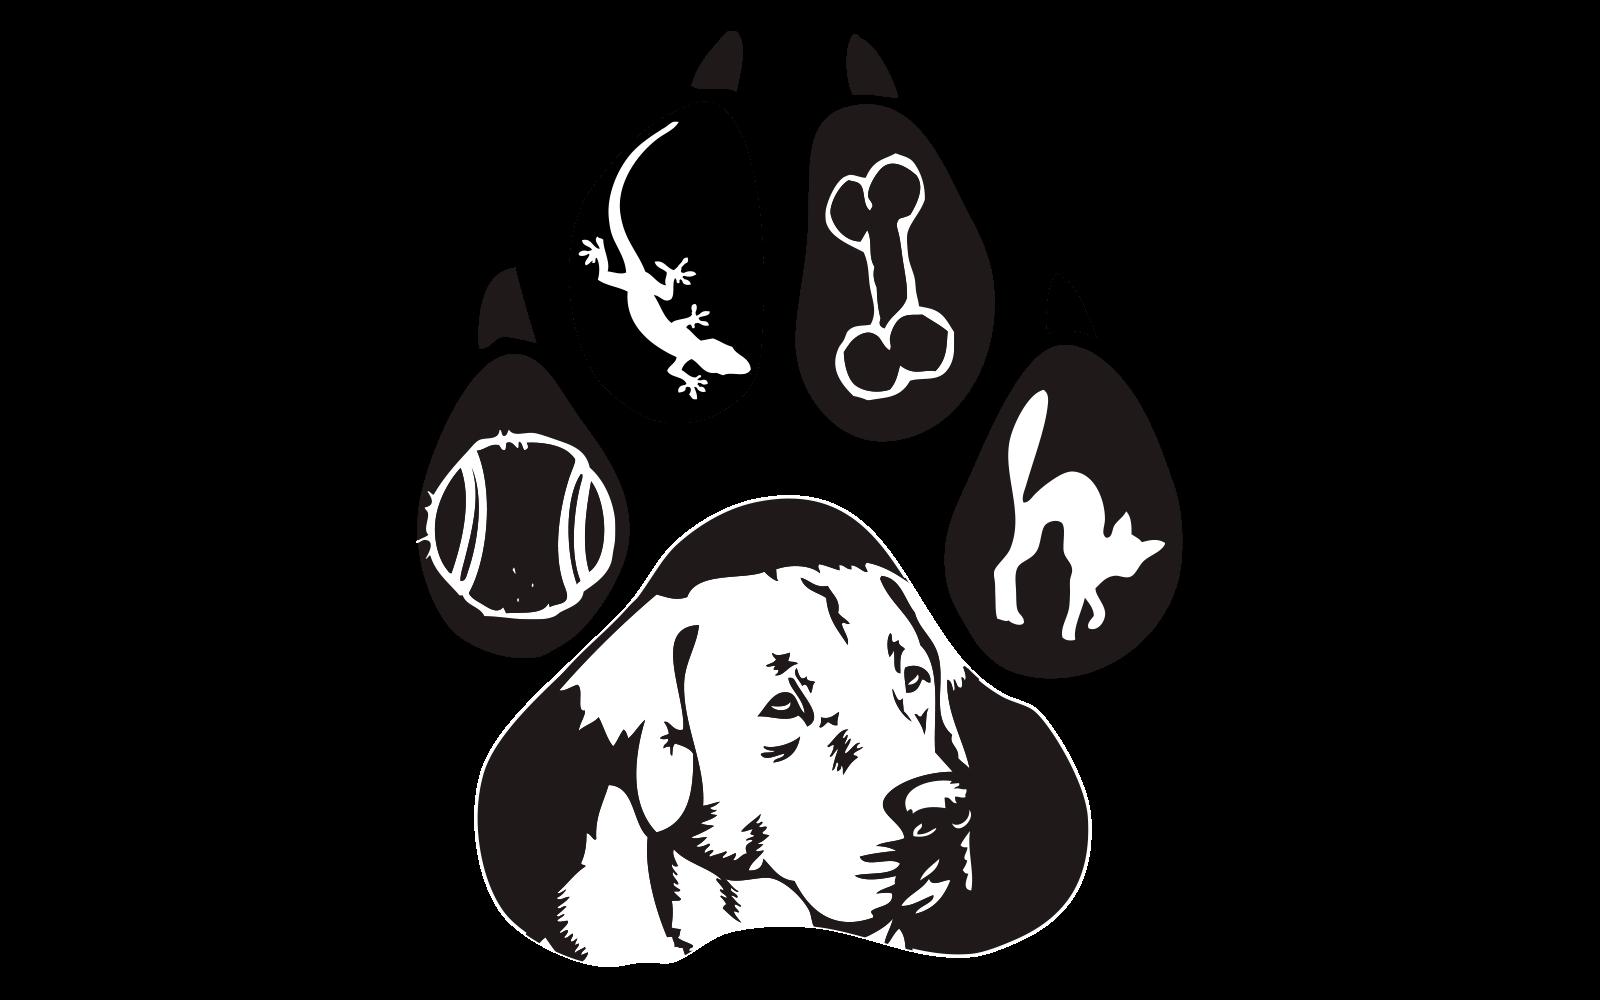 pf-logo-schepsels-spullen